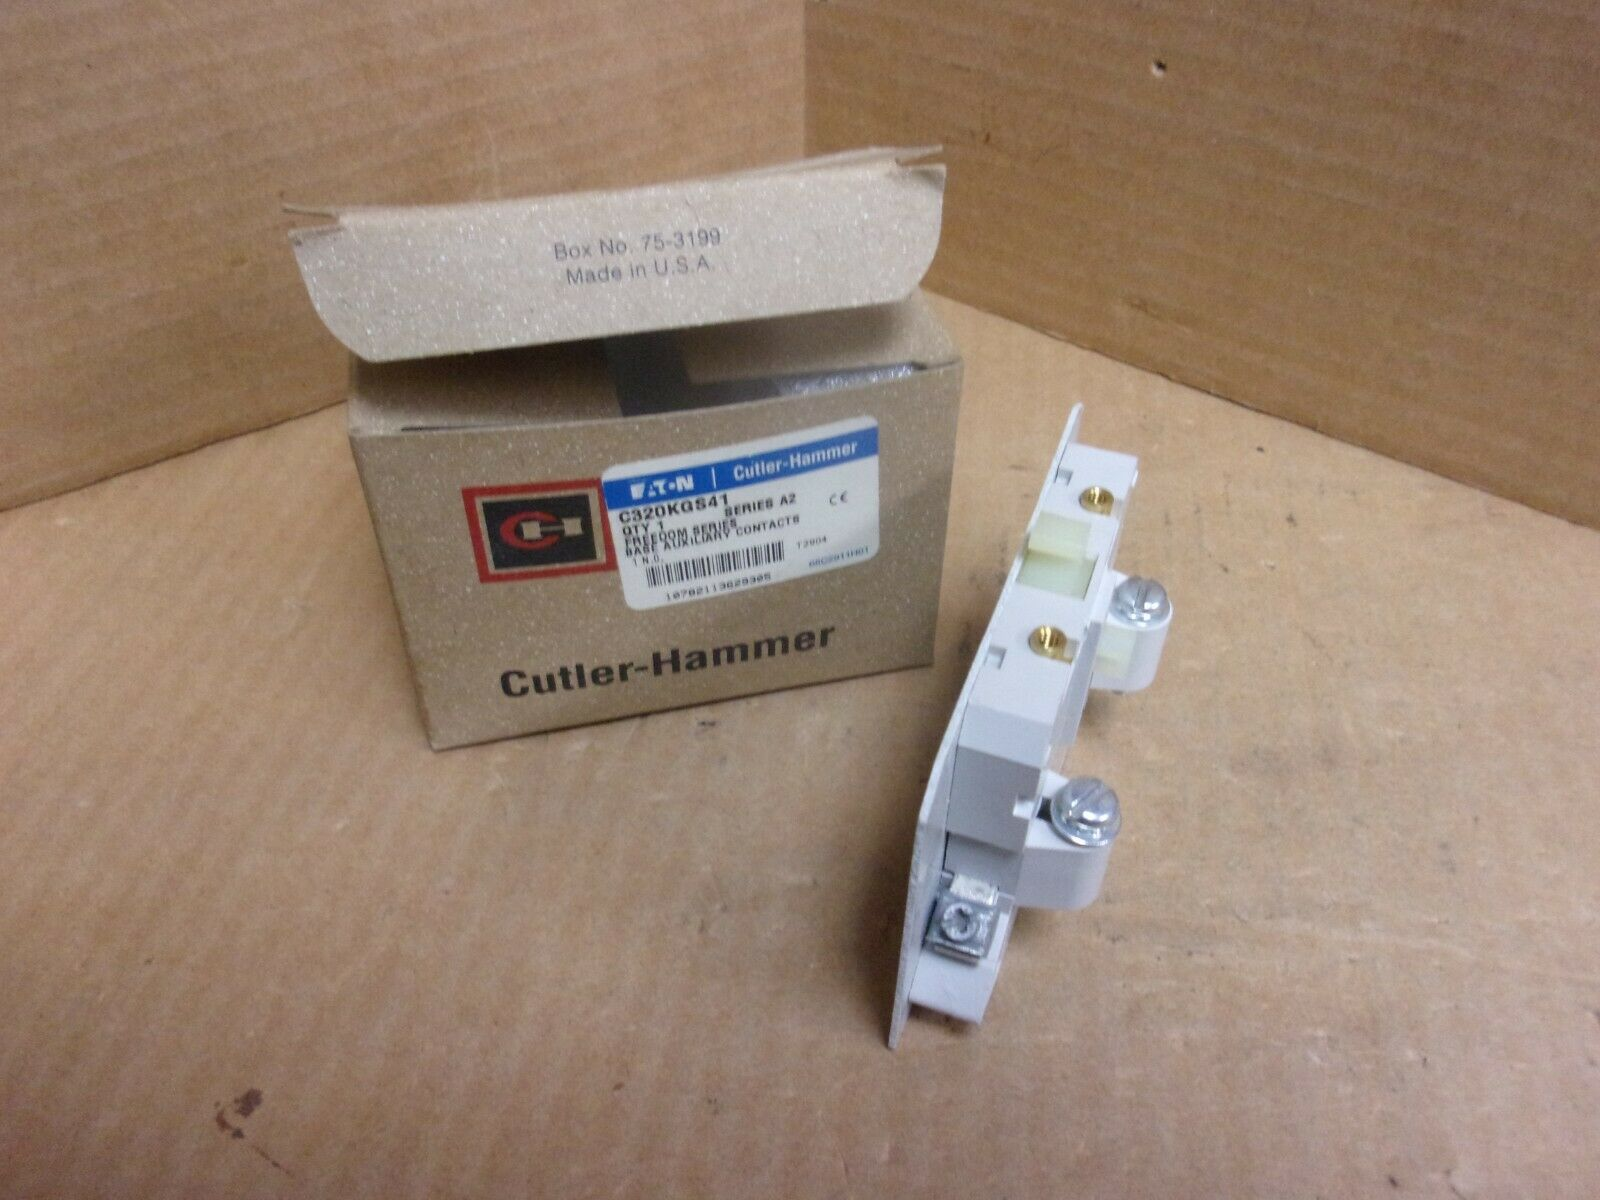 Final sale price Cutler-Hammer C320KGS41 Industrial